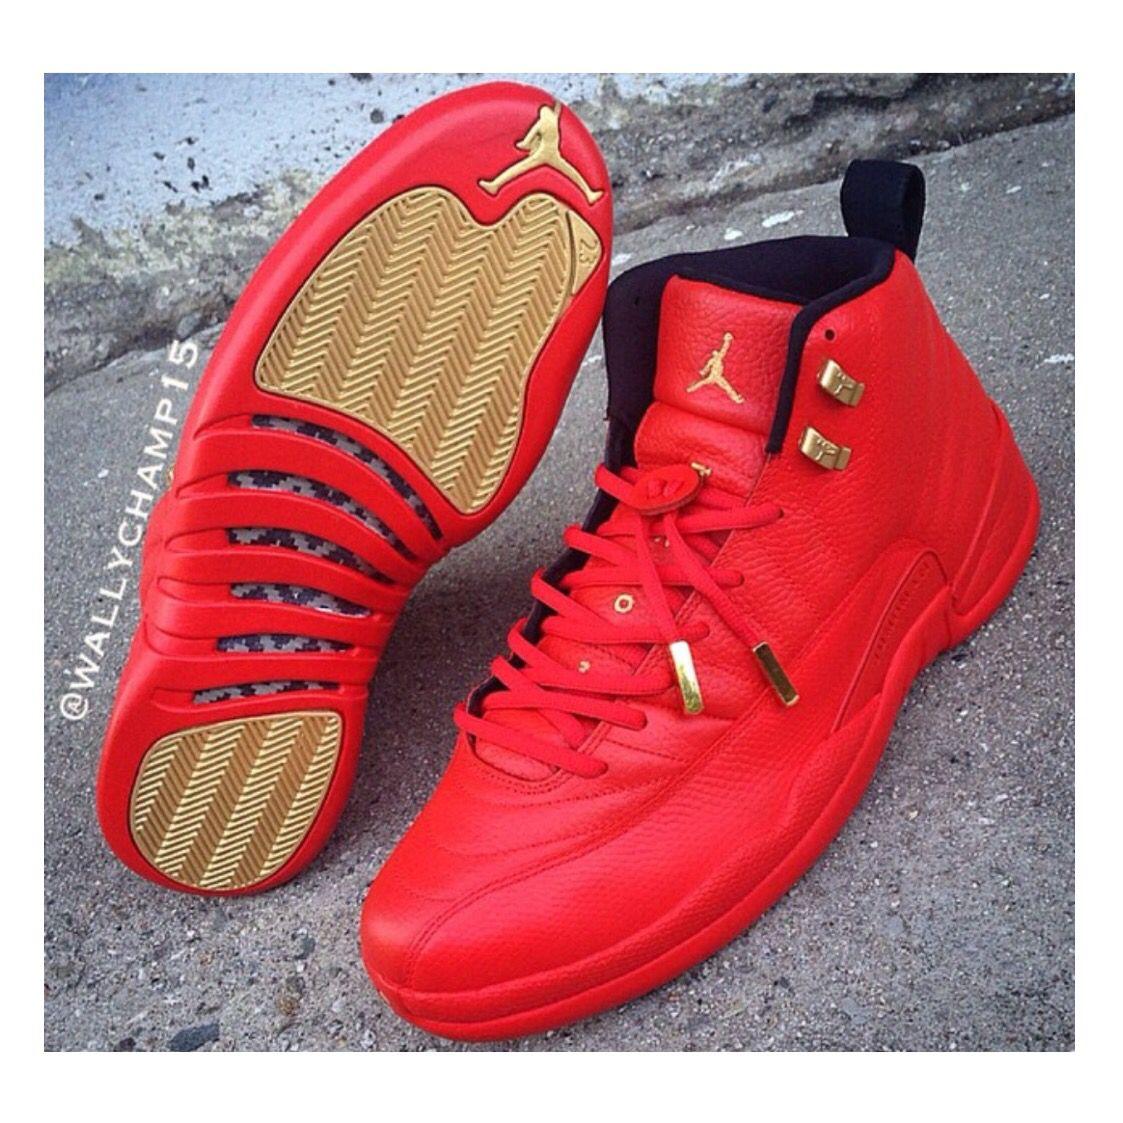 premium selection 9fc57 ae681 This Jordan 12 custom was made by @Wallychamp15 (Instagram ...